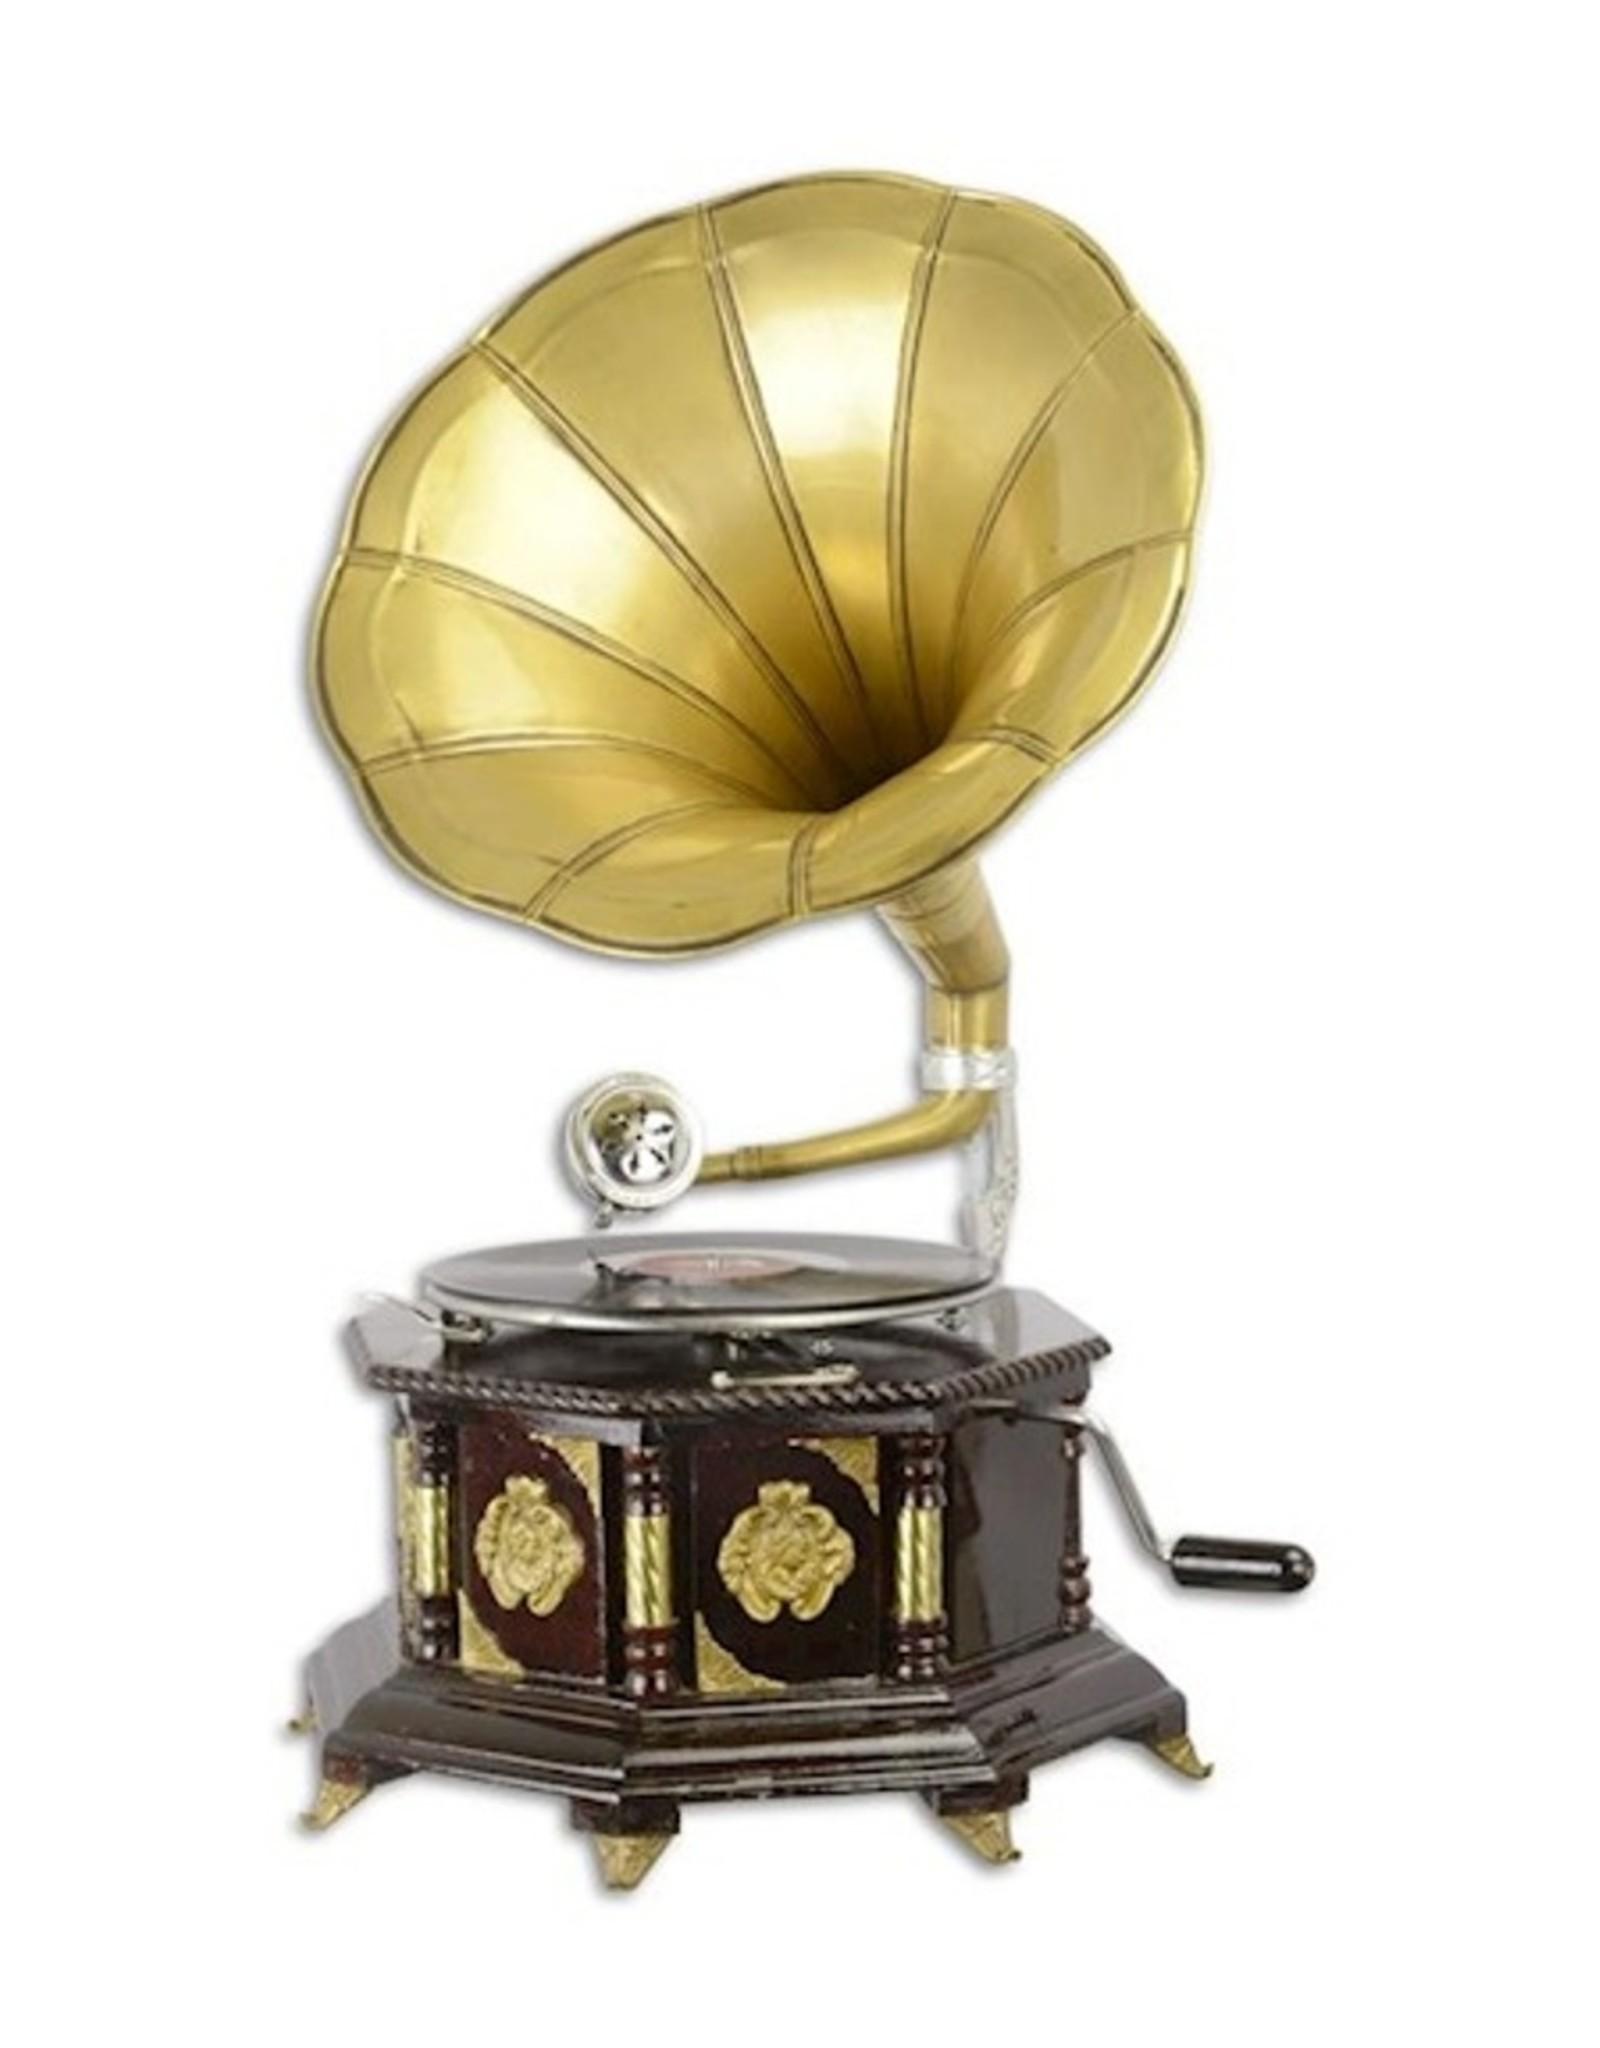 Gramophone company Miscellaneous - Grammofoon - Ouderwetse platenspeler met hoorn ACHTAGONAAL